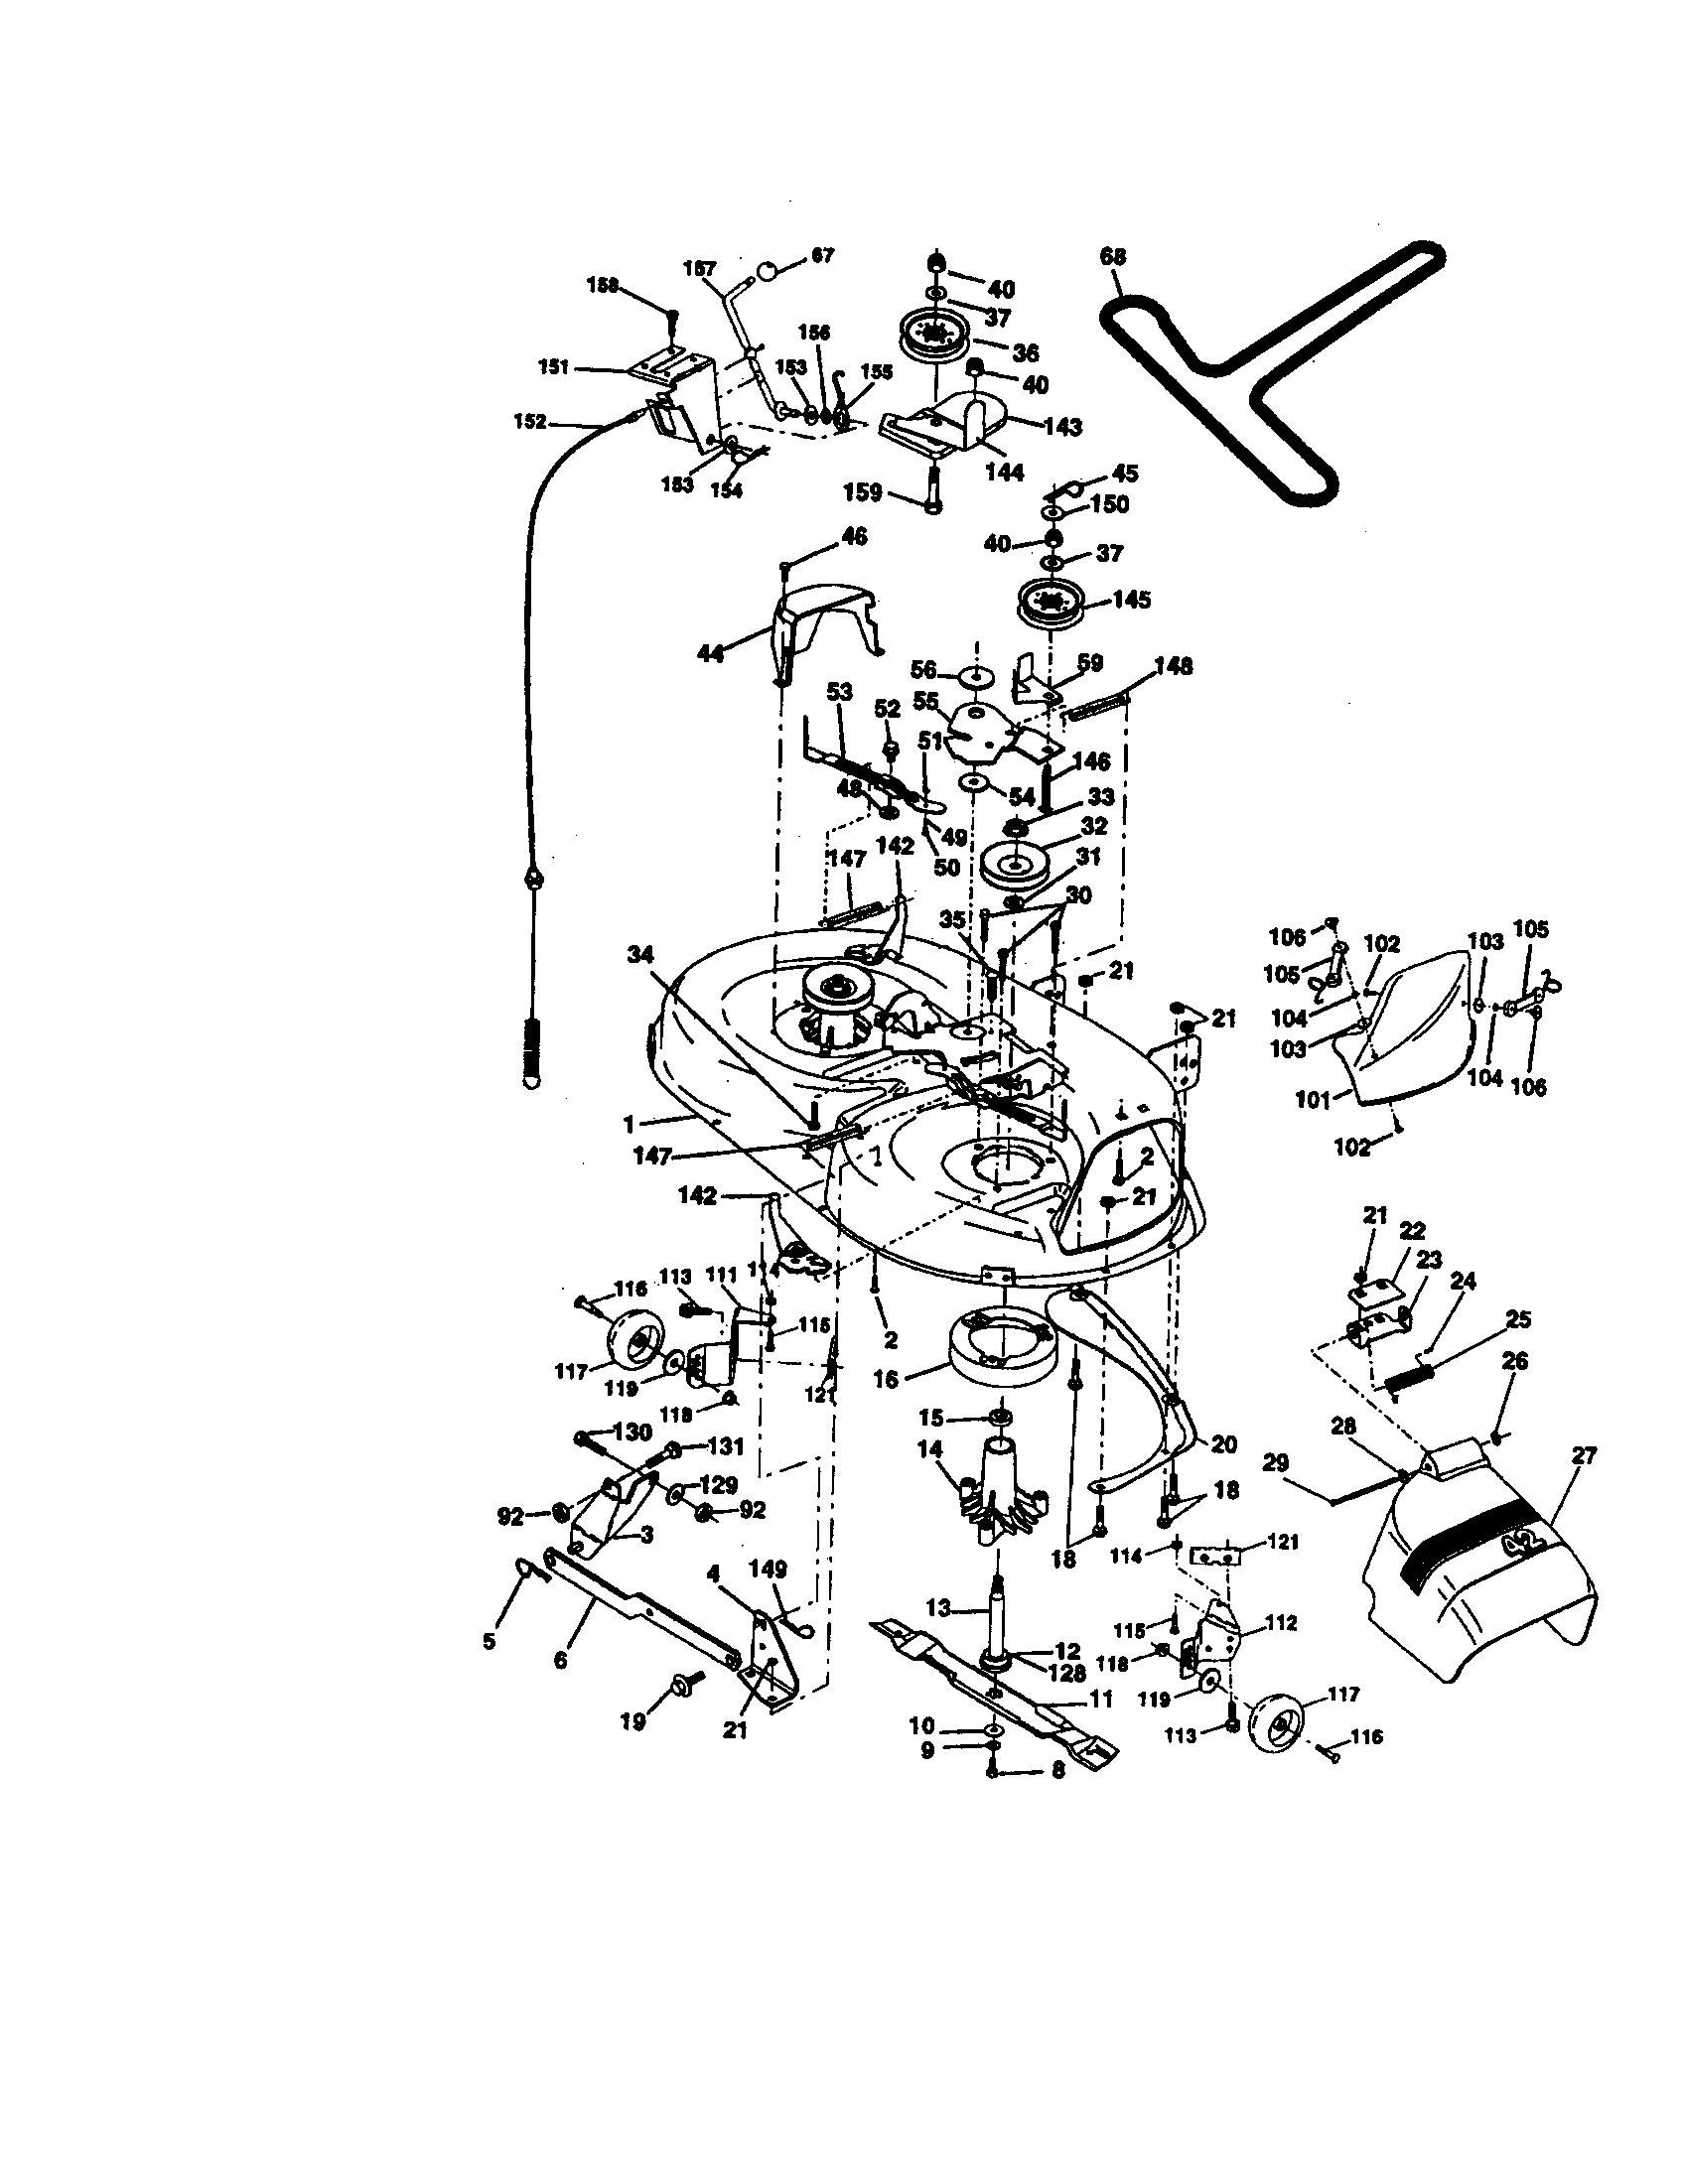 Ezgo series wiring diagram wiring diagram and fuse box